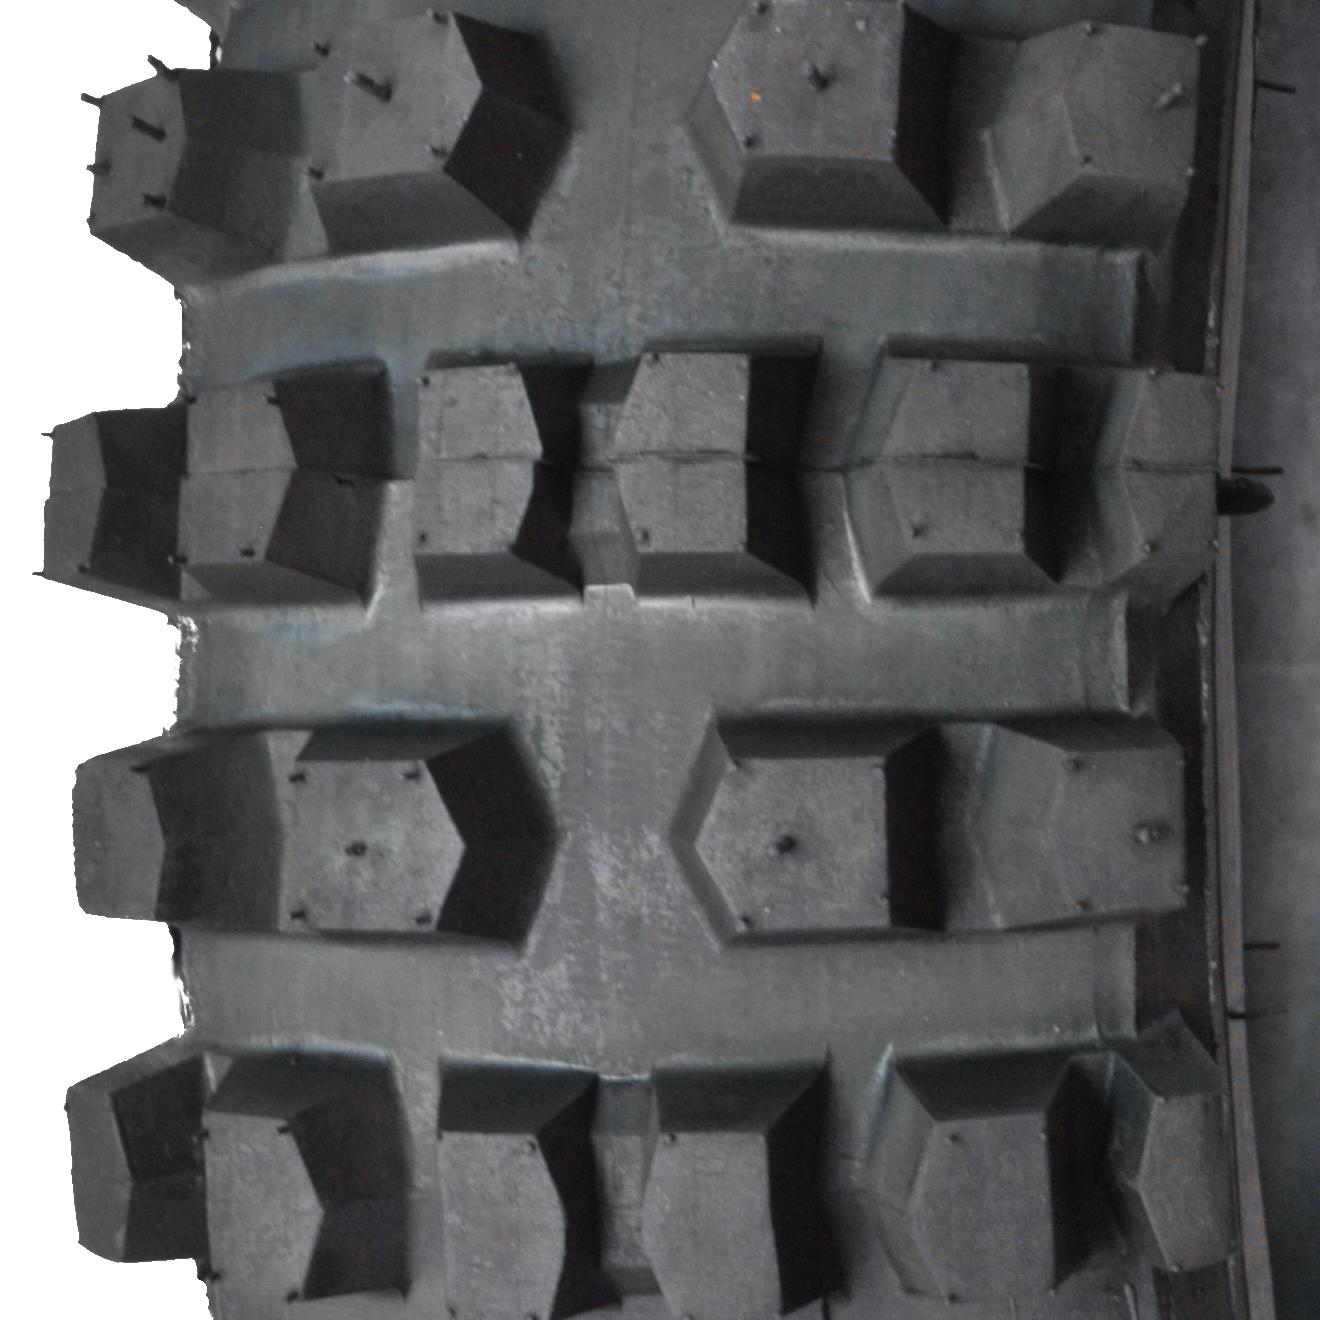 961b048c6 Off-road tire Maxi Cross 205 70 R15 Italian company Pneus Ovada